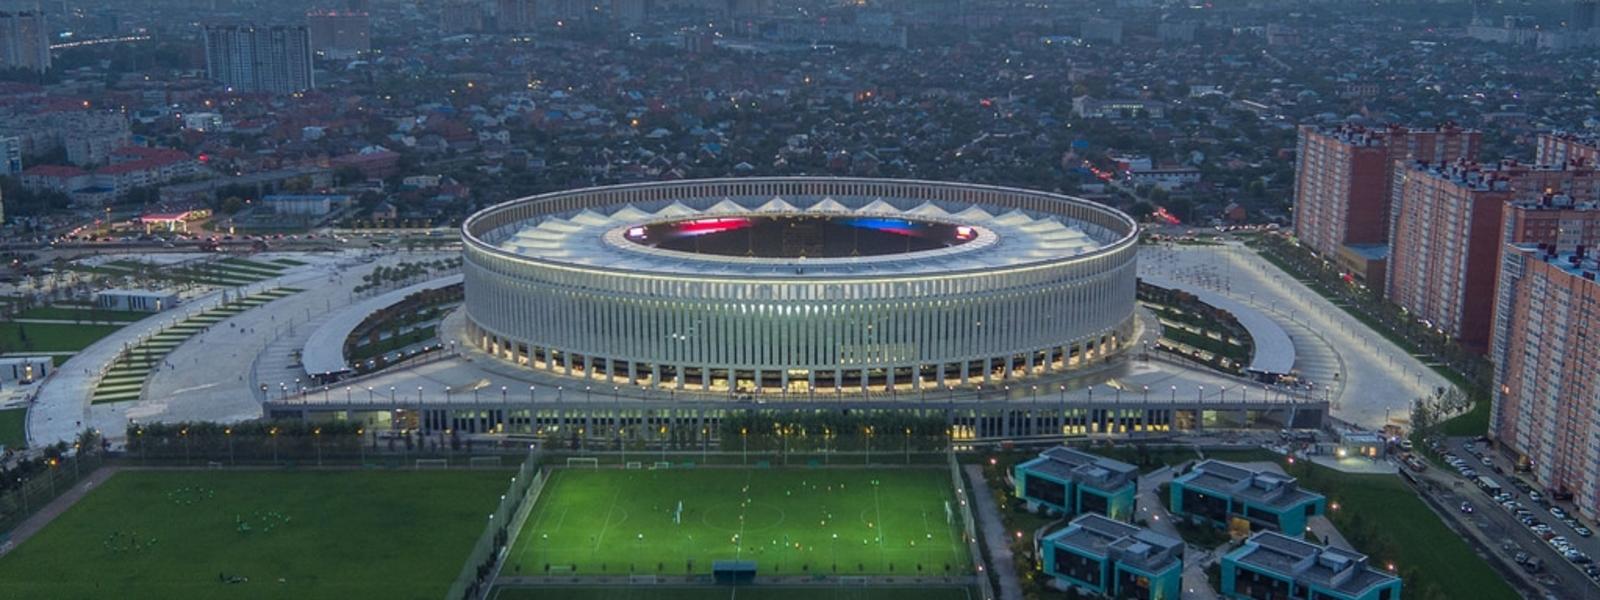 ФК 'Краснодар' | RBWorld.org